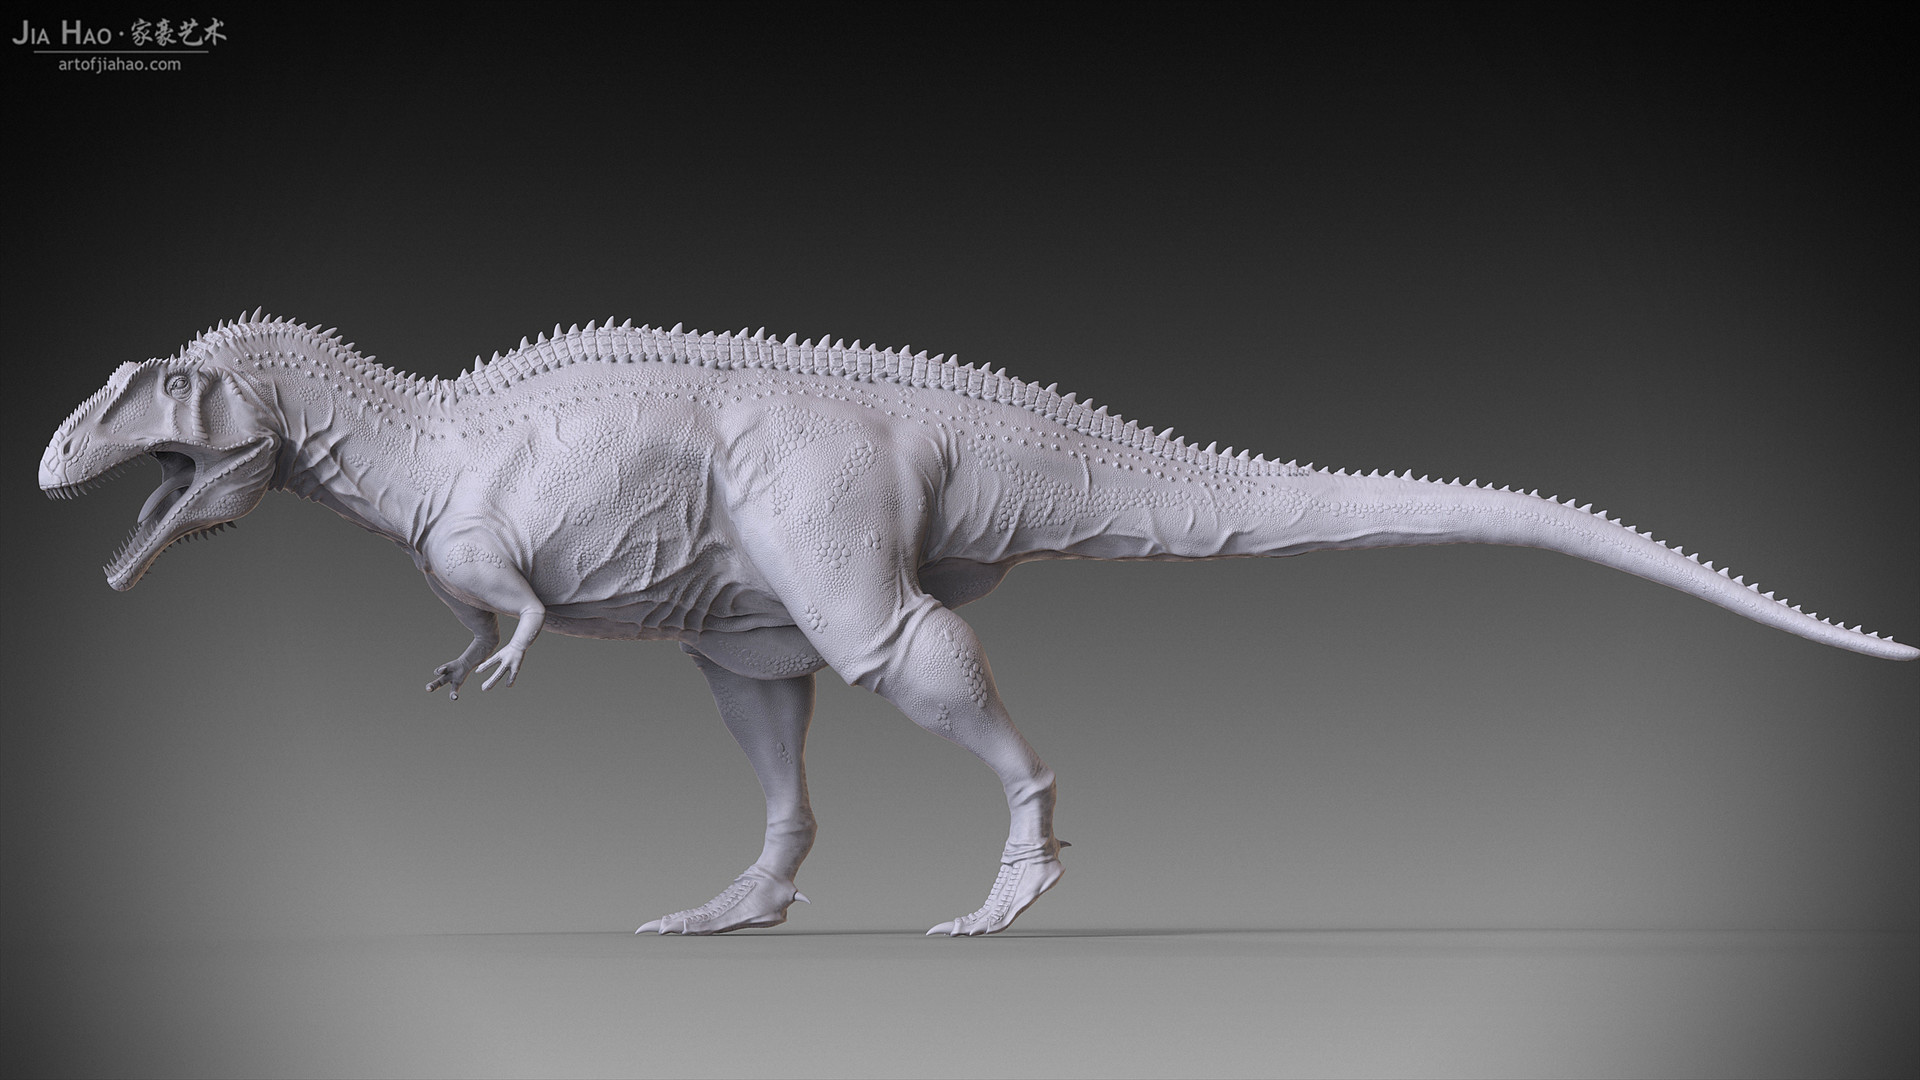 Jia hao acrocanthosaurus 04